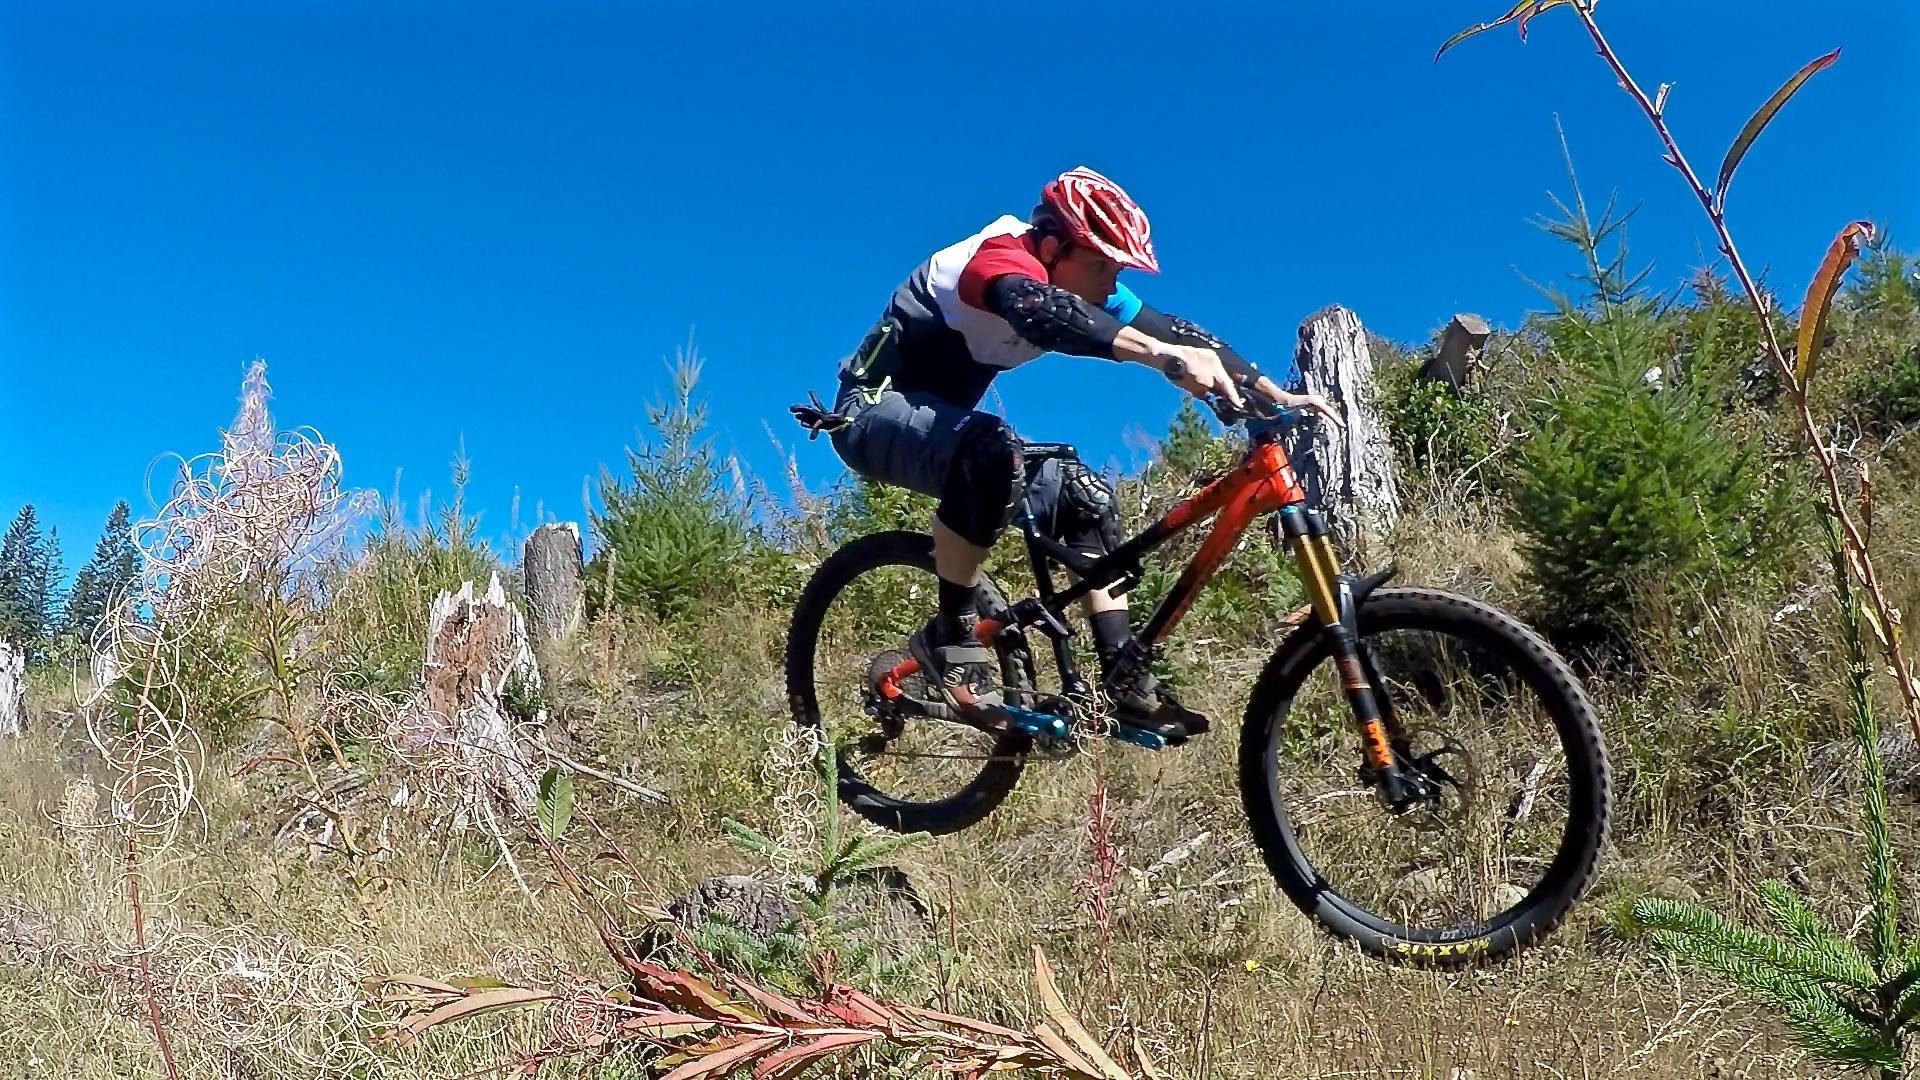 fd11ebb38 Build Custom Mountain Bike Shorts and Jerseys With Northwest Tech ...